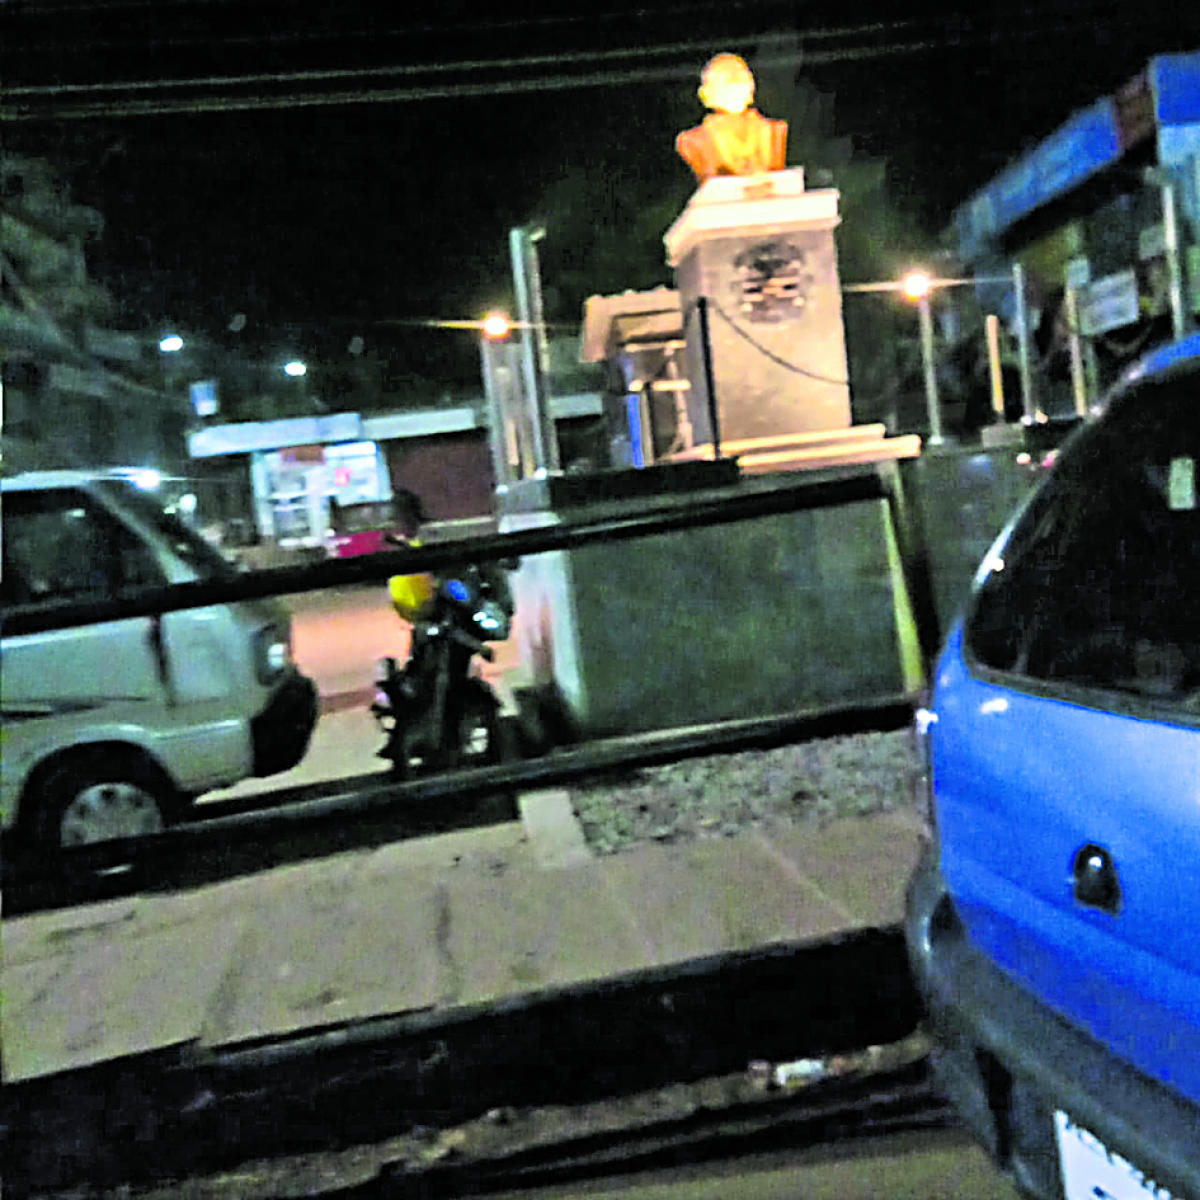 The illuminated bust of Late Dr Kurunji Venkataramana Gowda at the private bus stand in Sullia.